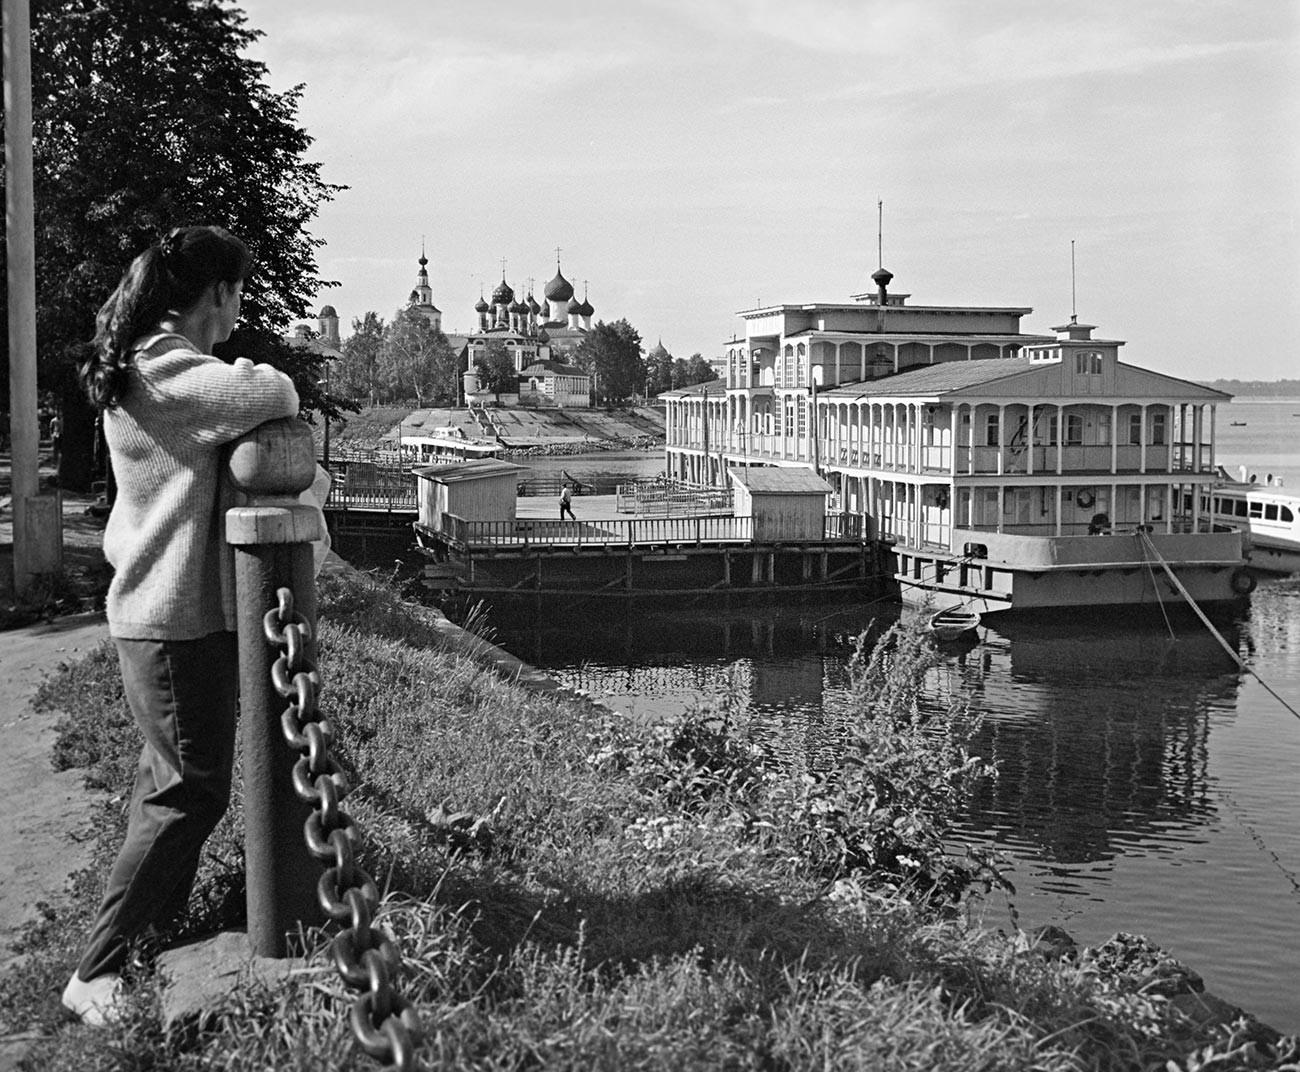 River terminal and church in Uglich, 1965.